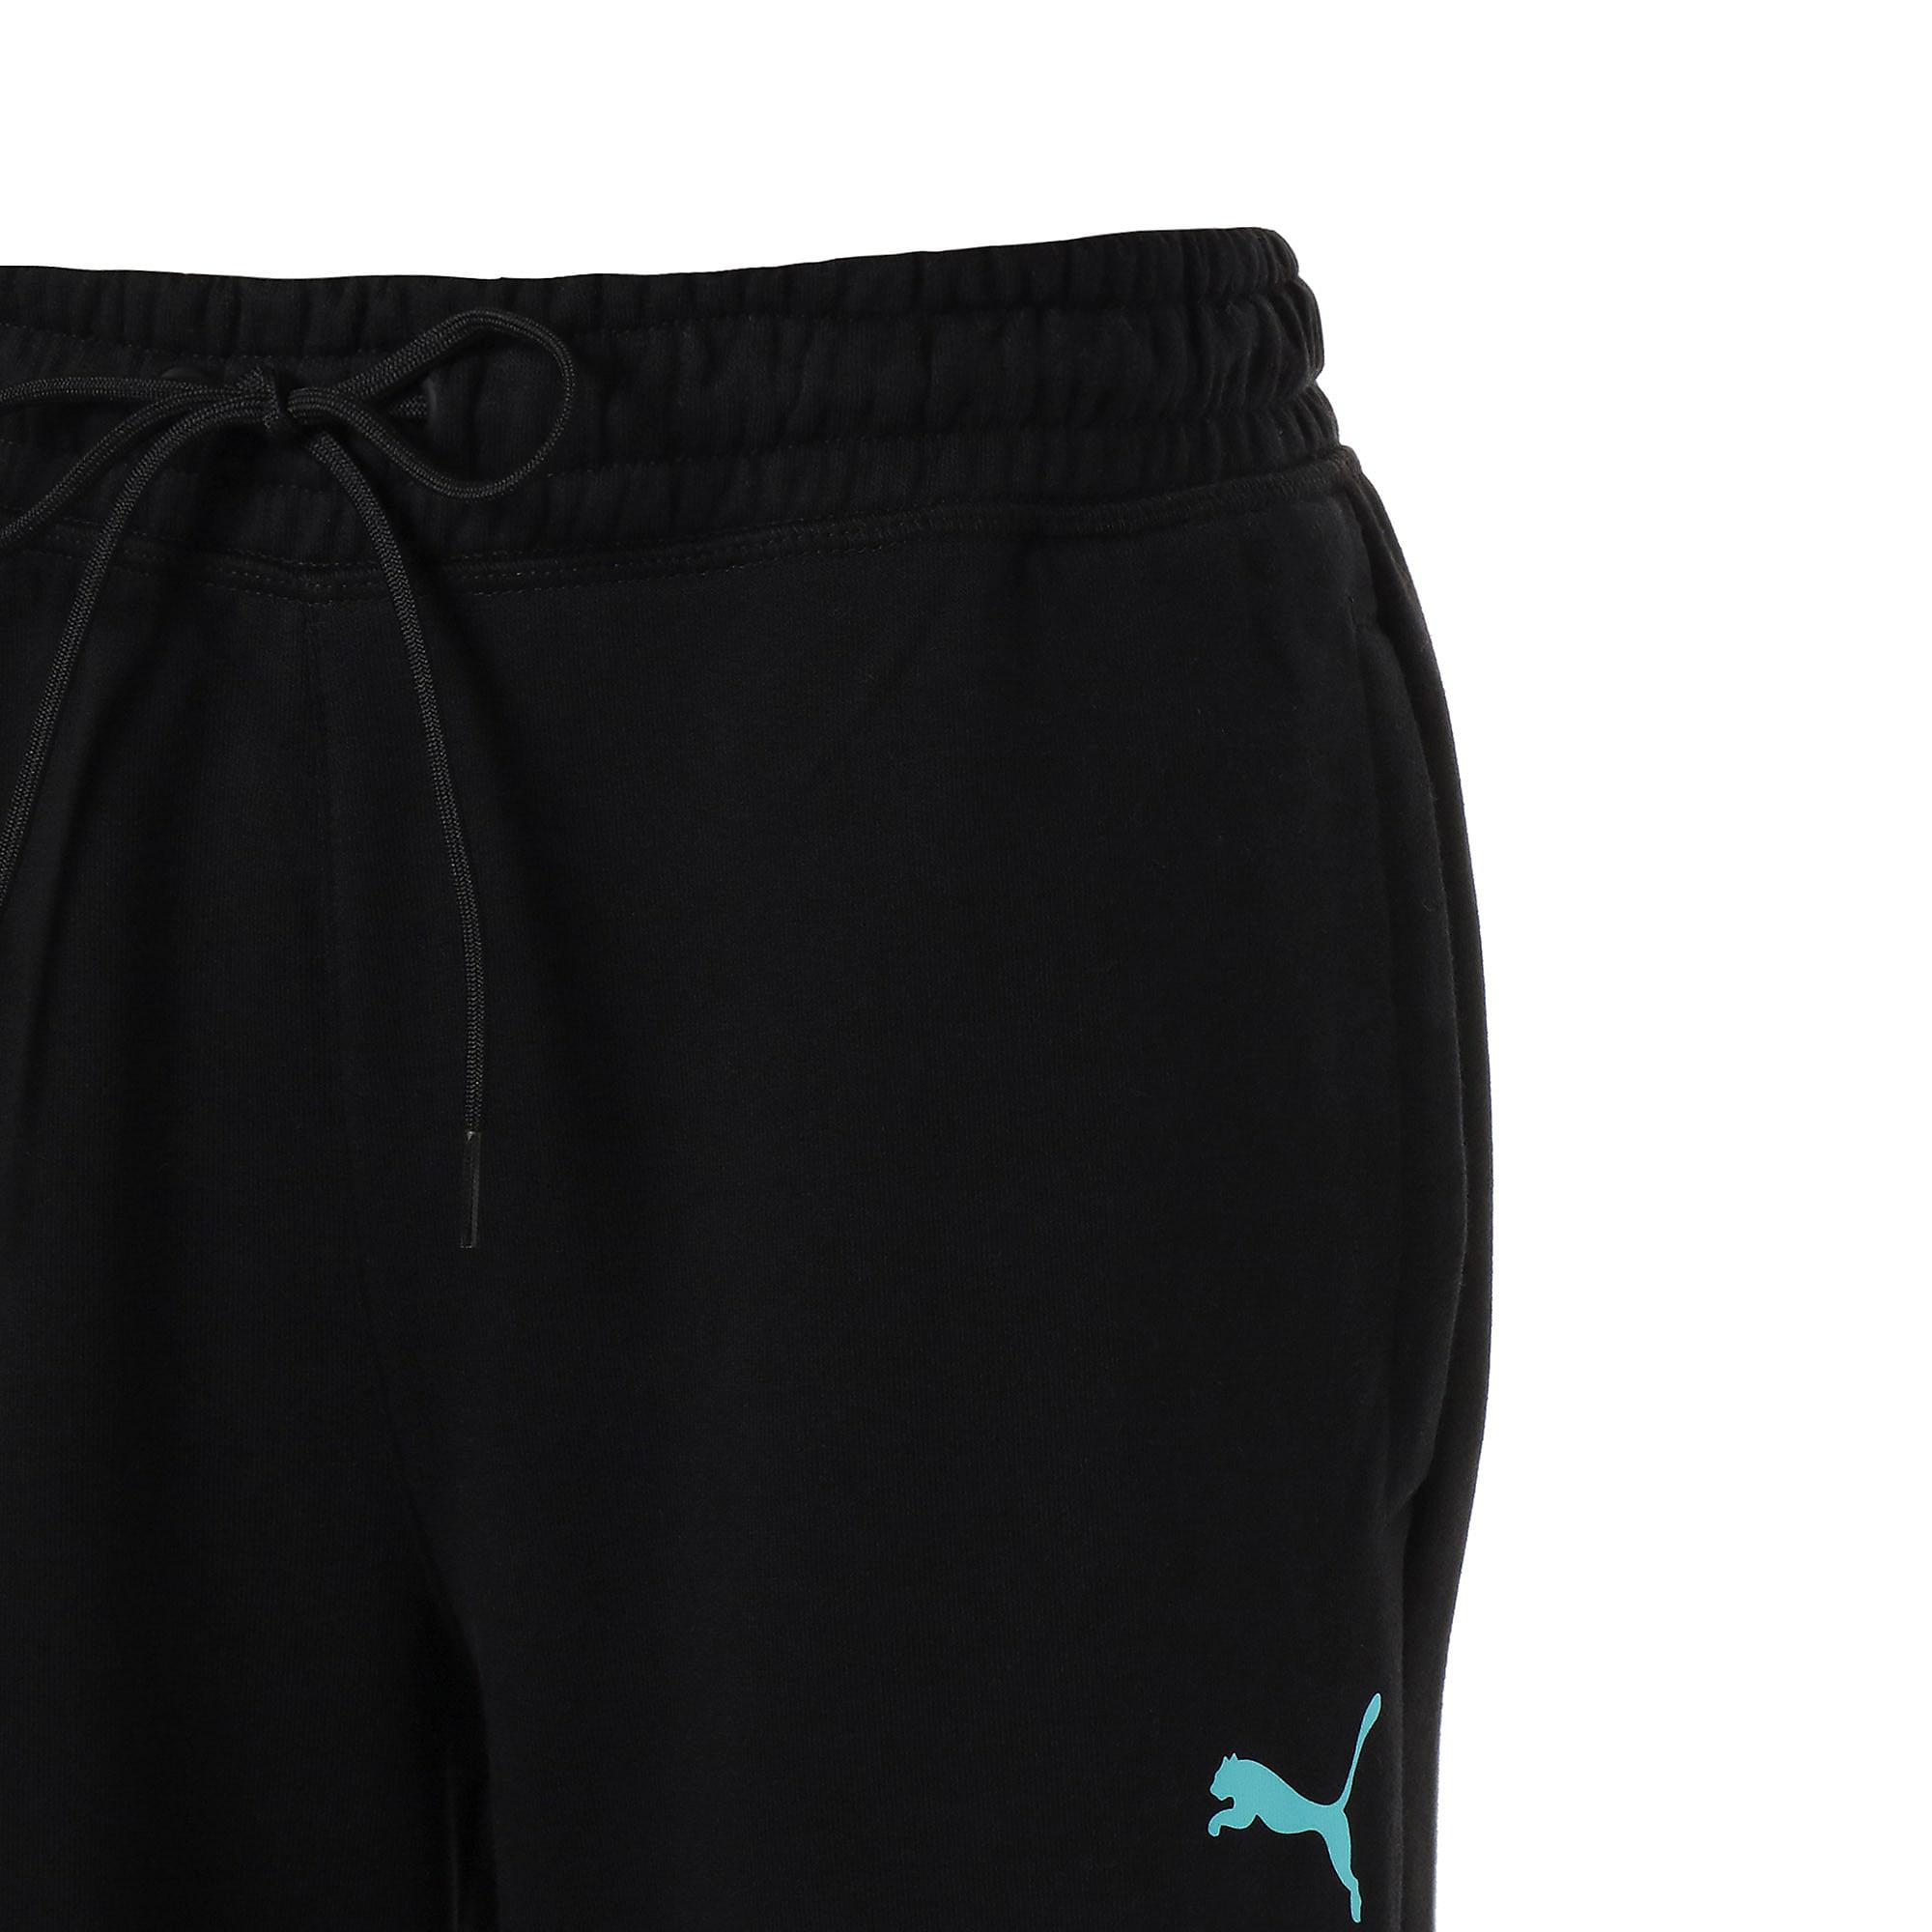 Thumbnail 4 of MCS POOL TRACK PANTS, Puma Black, medium-JPN